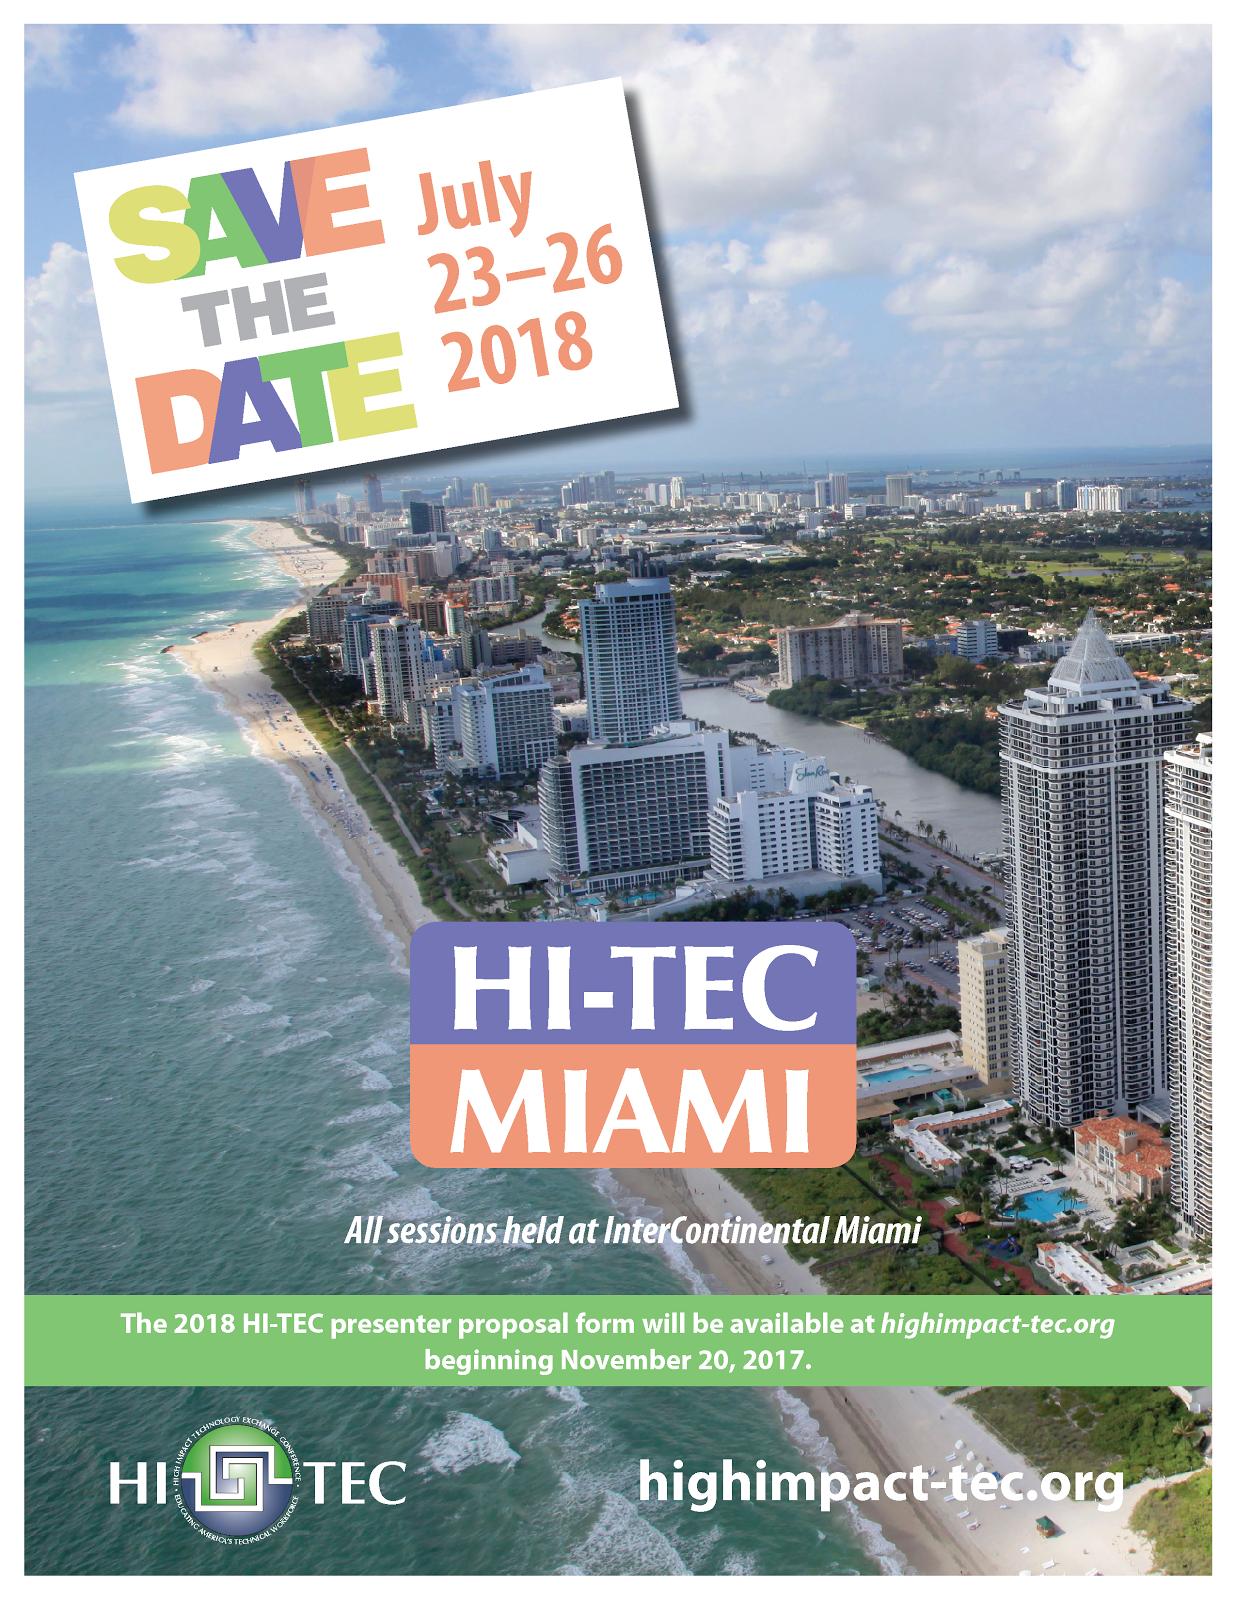 HITEC Miami 2018